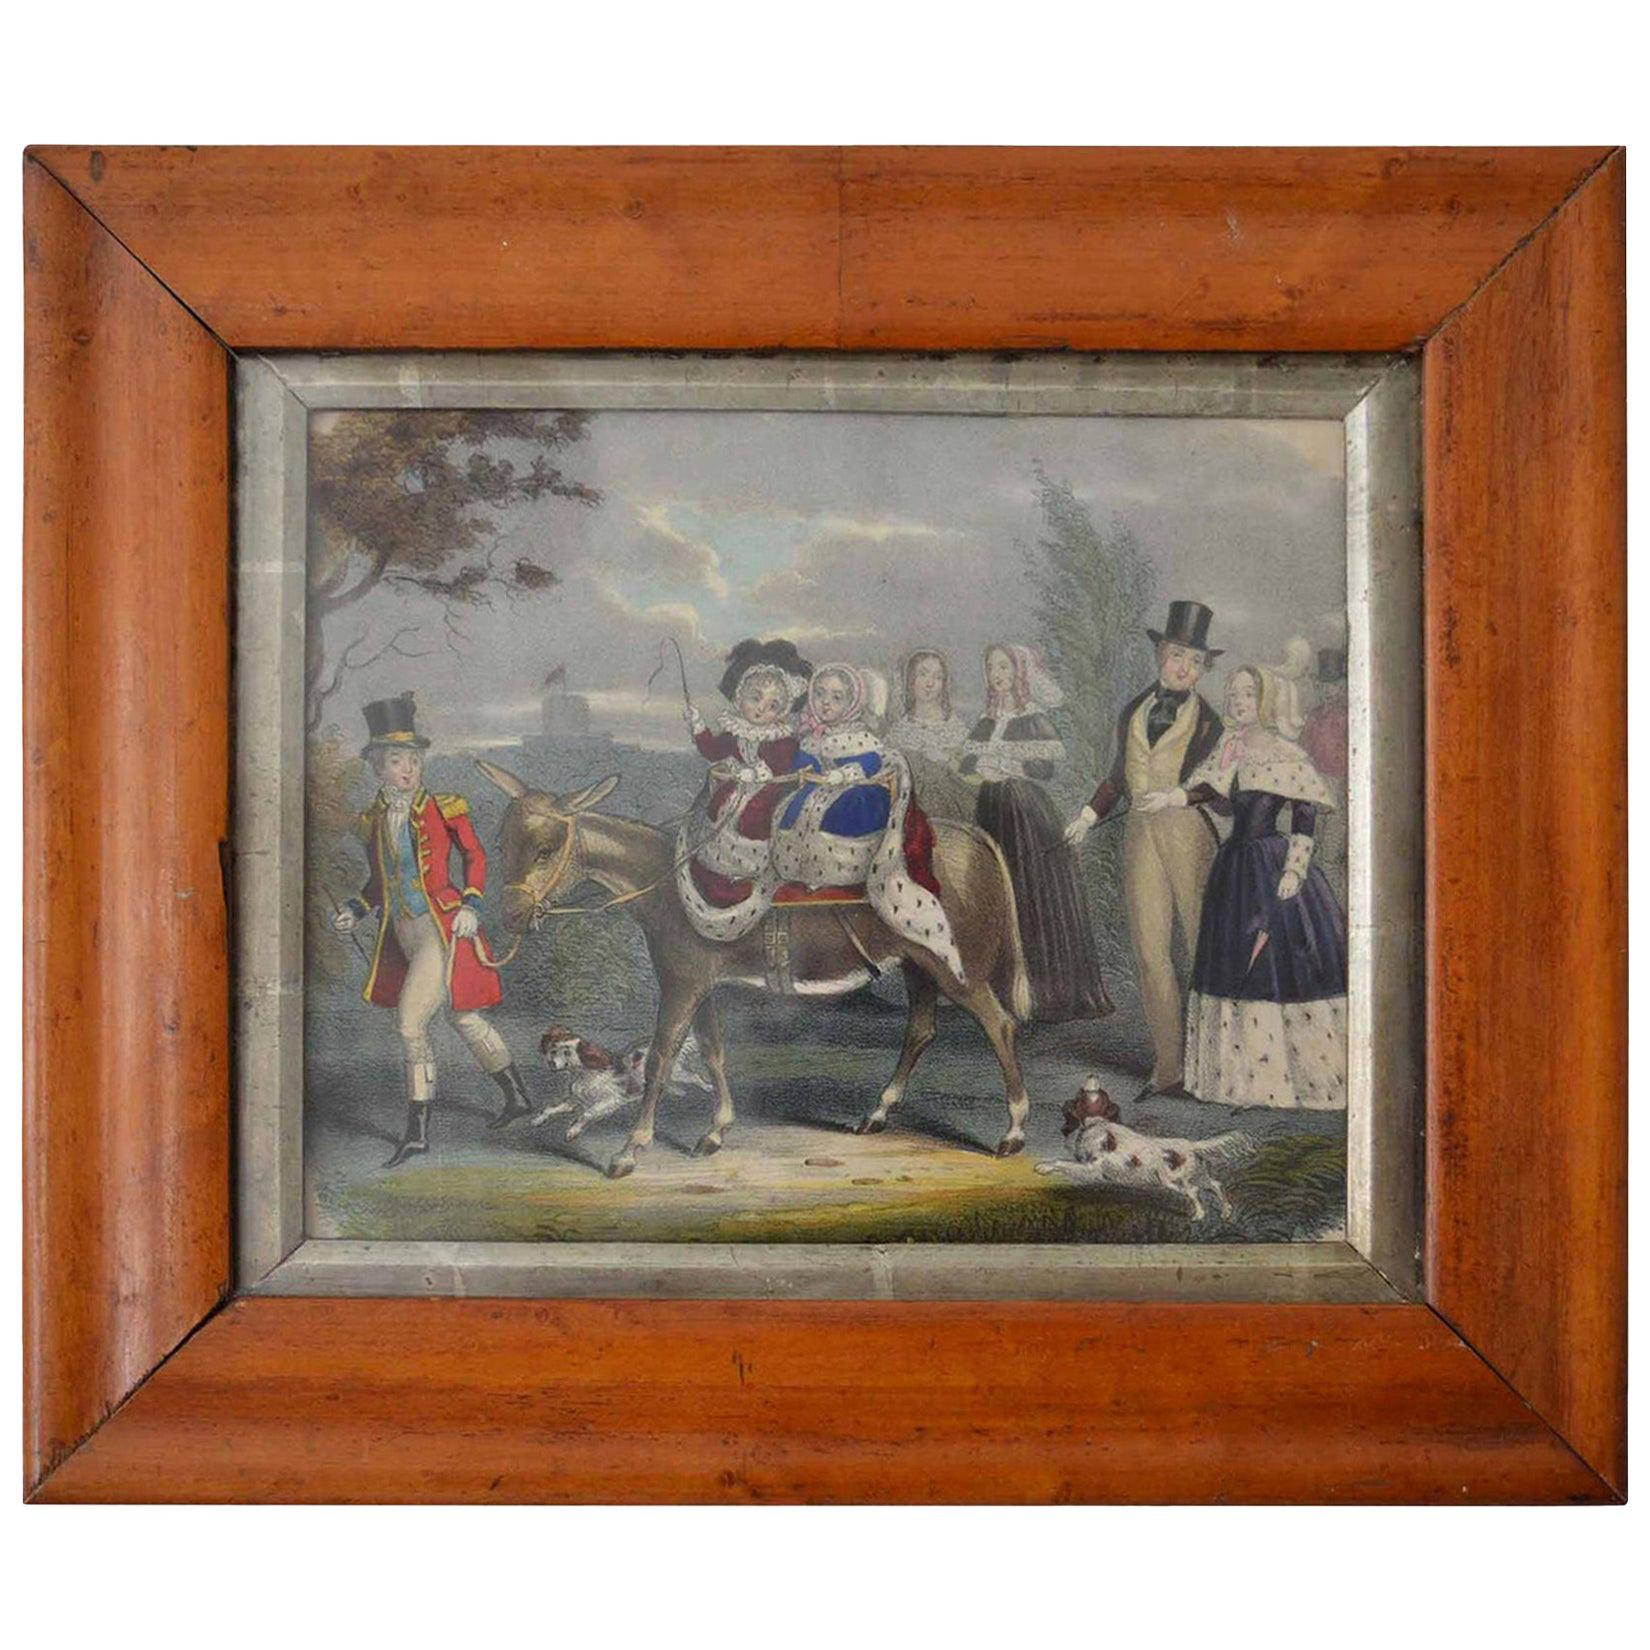 Framed Antique Print of a Royal Party, English, circa 1850